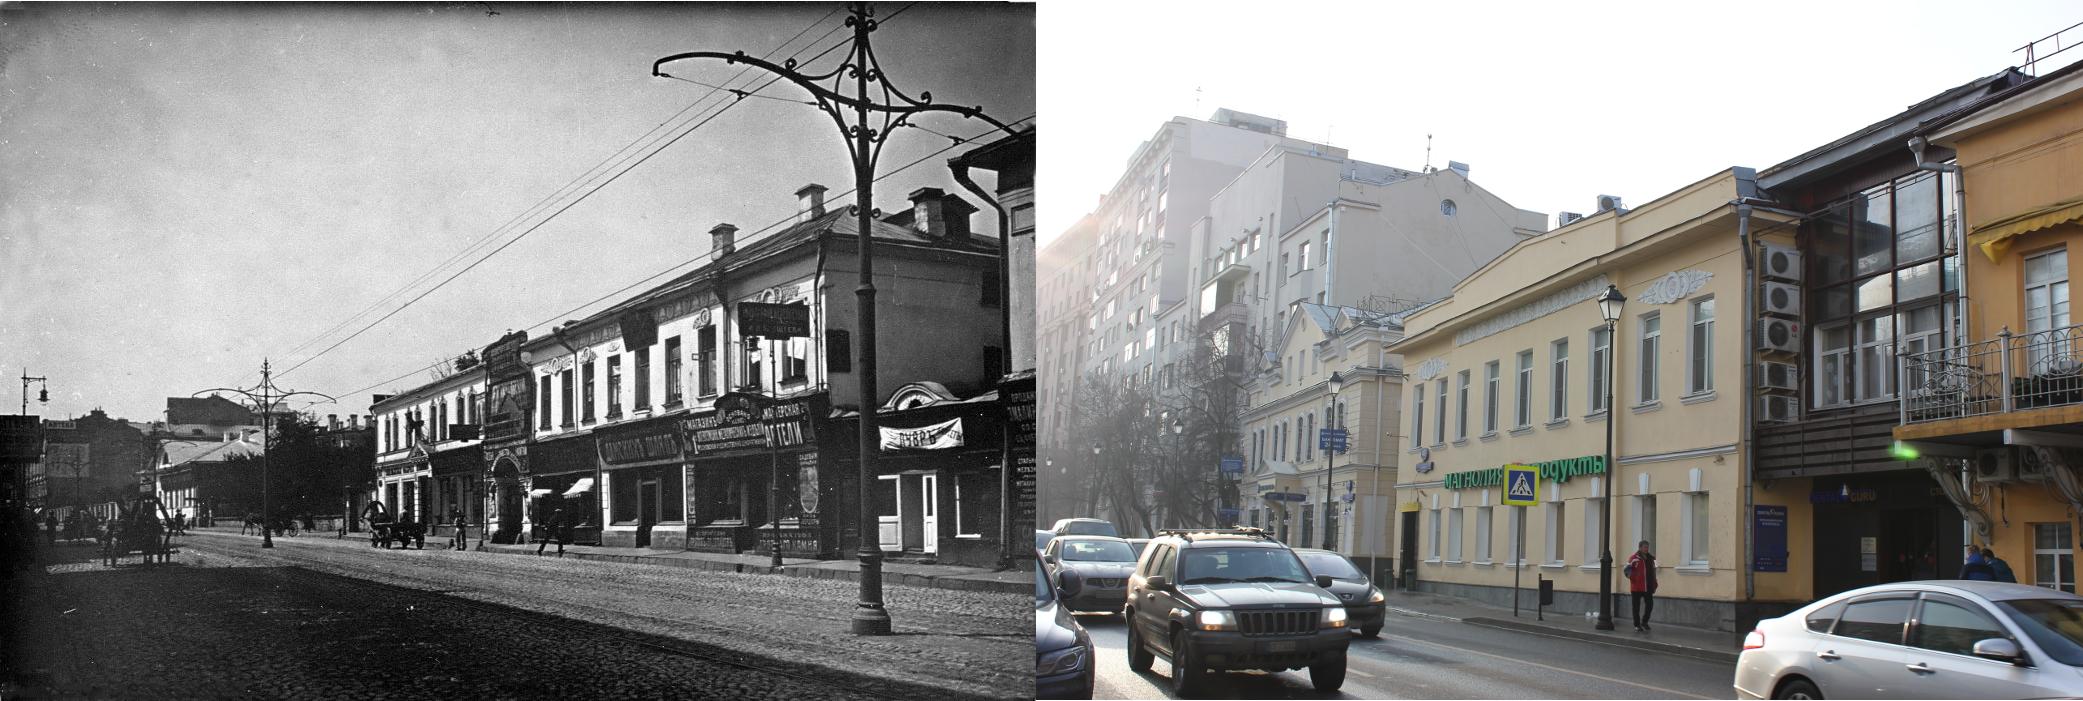 Москва Покровка